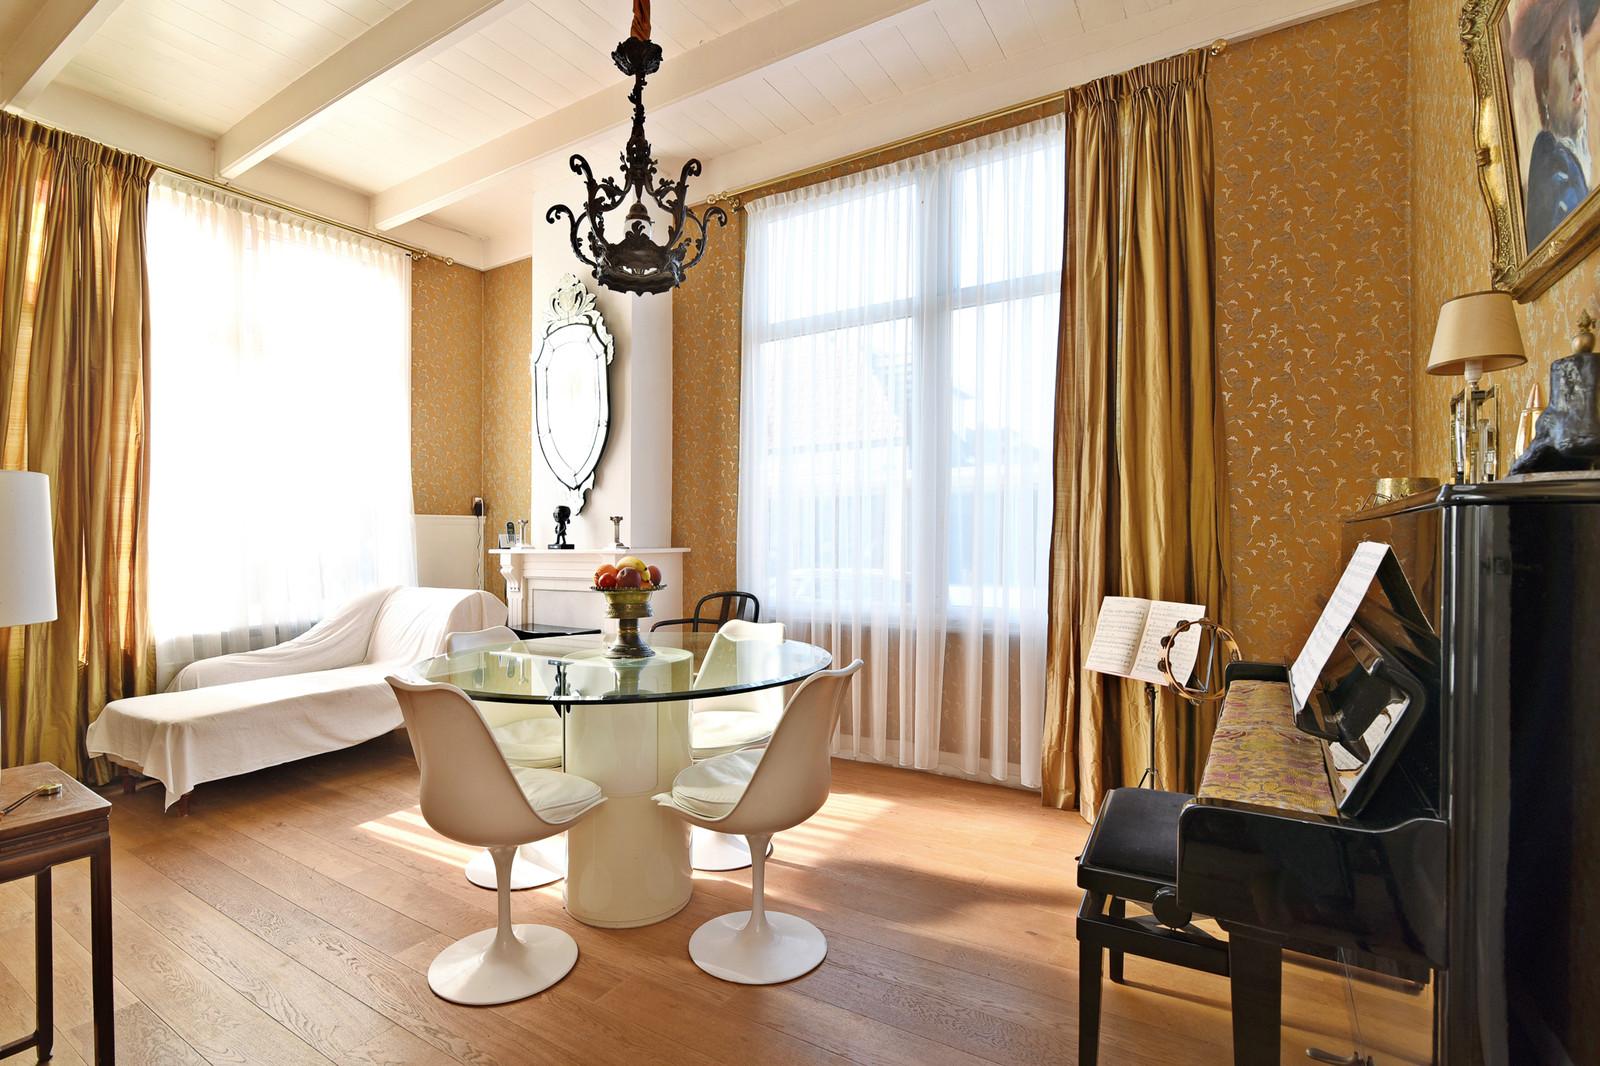 Home Creations | Vastgoed en Interieurfotograaf | Friesland